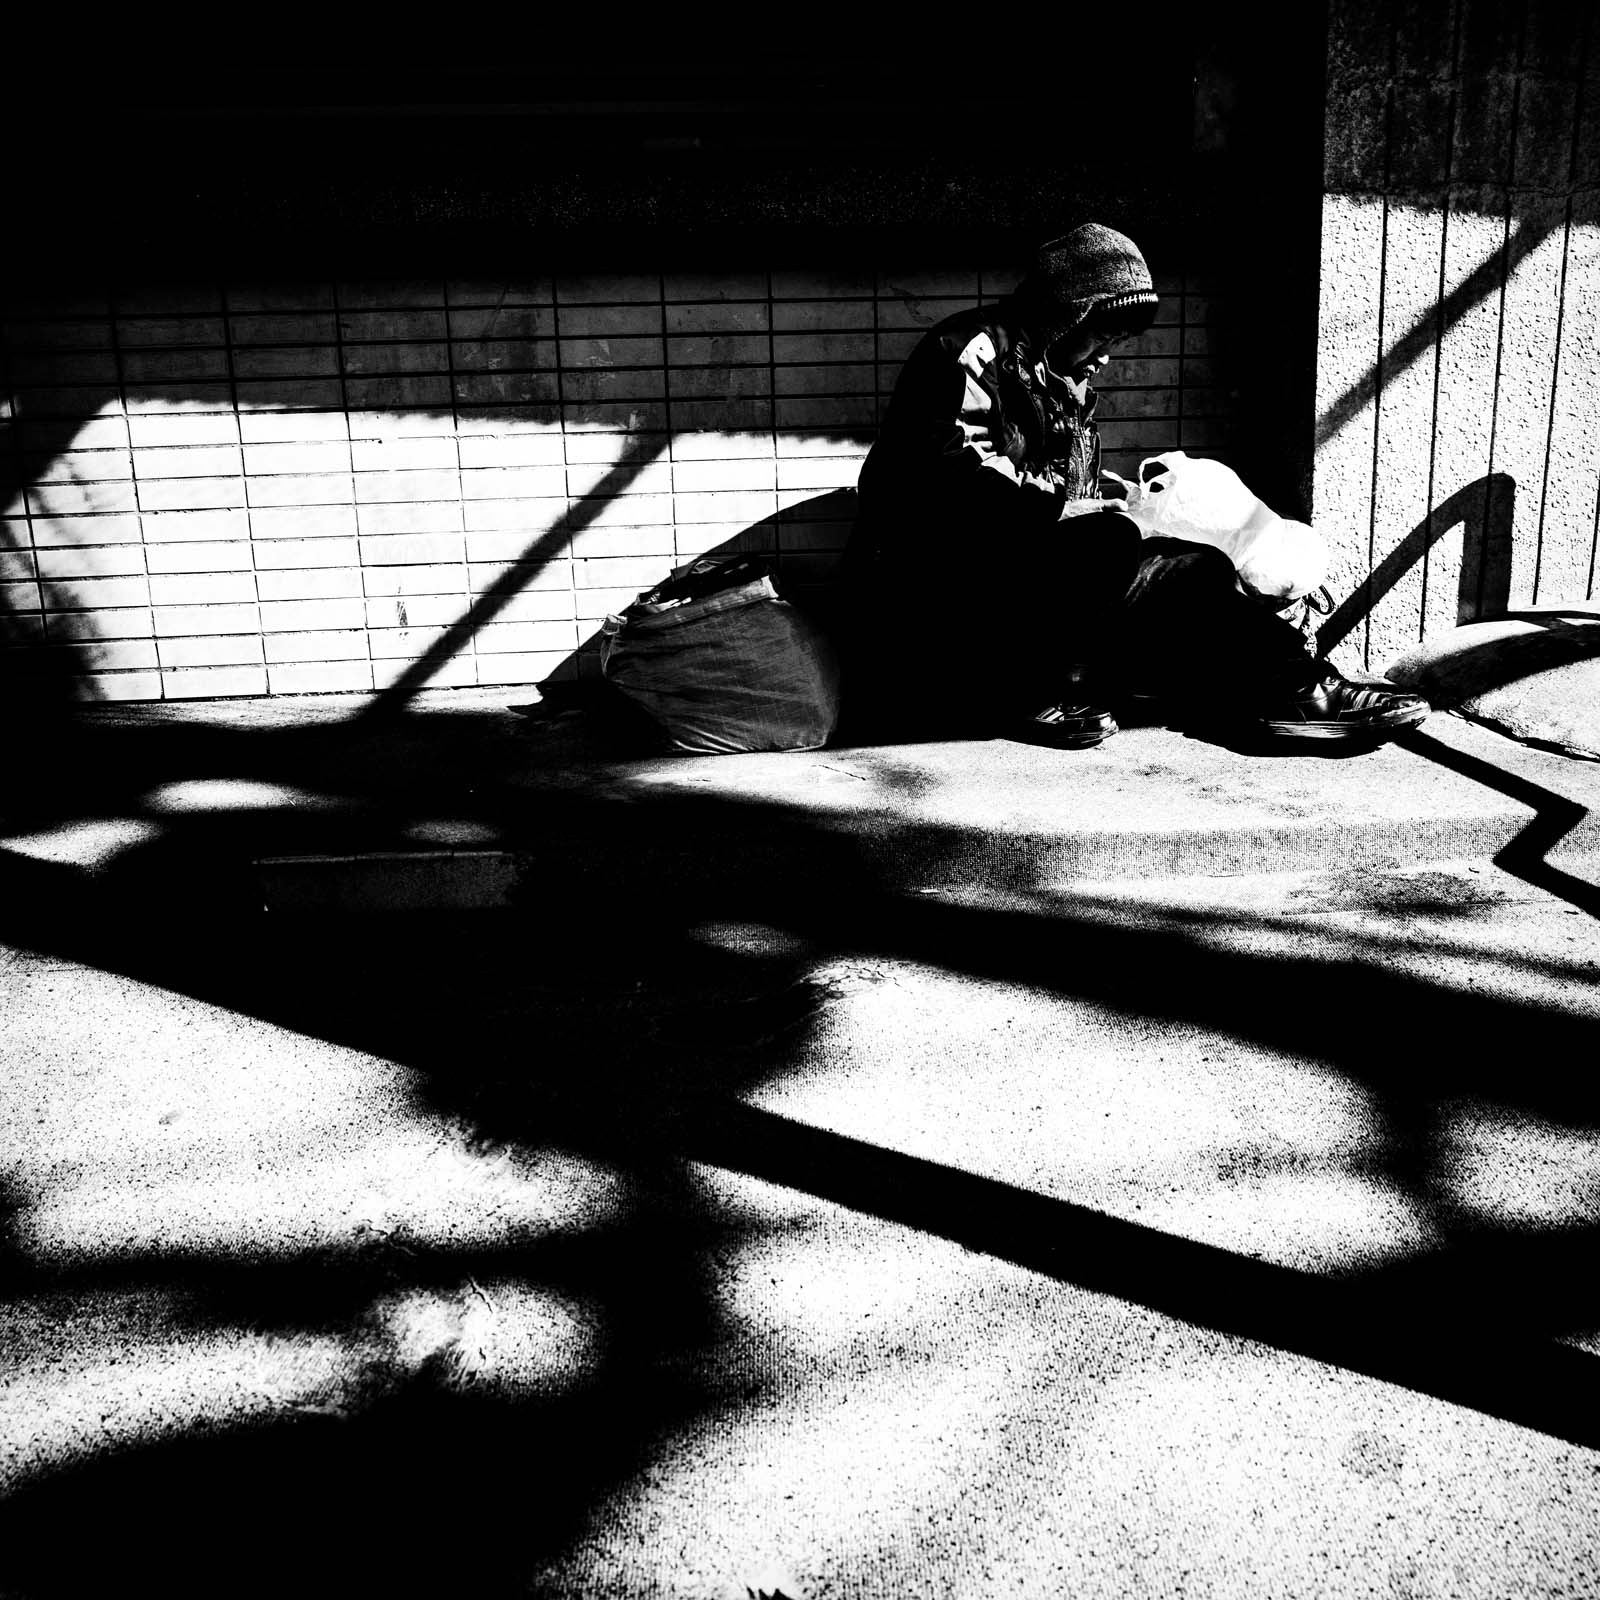 Sanya Shadowland